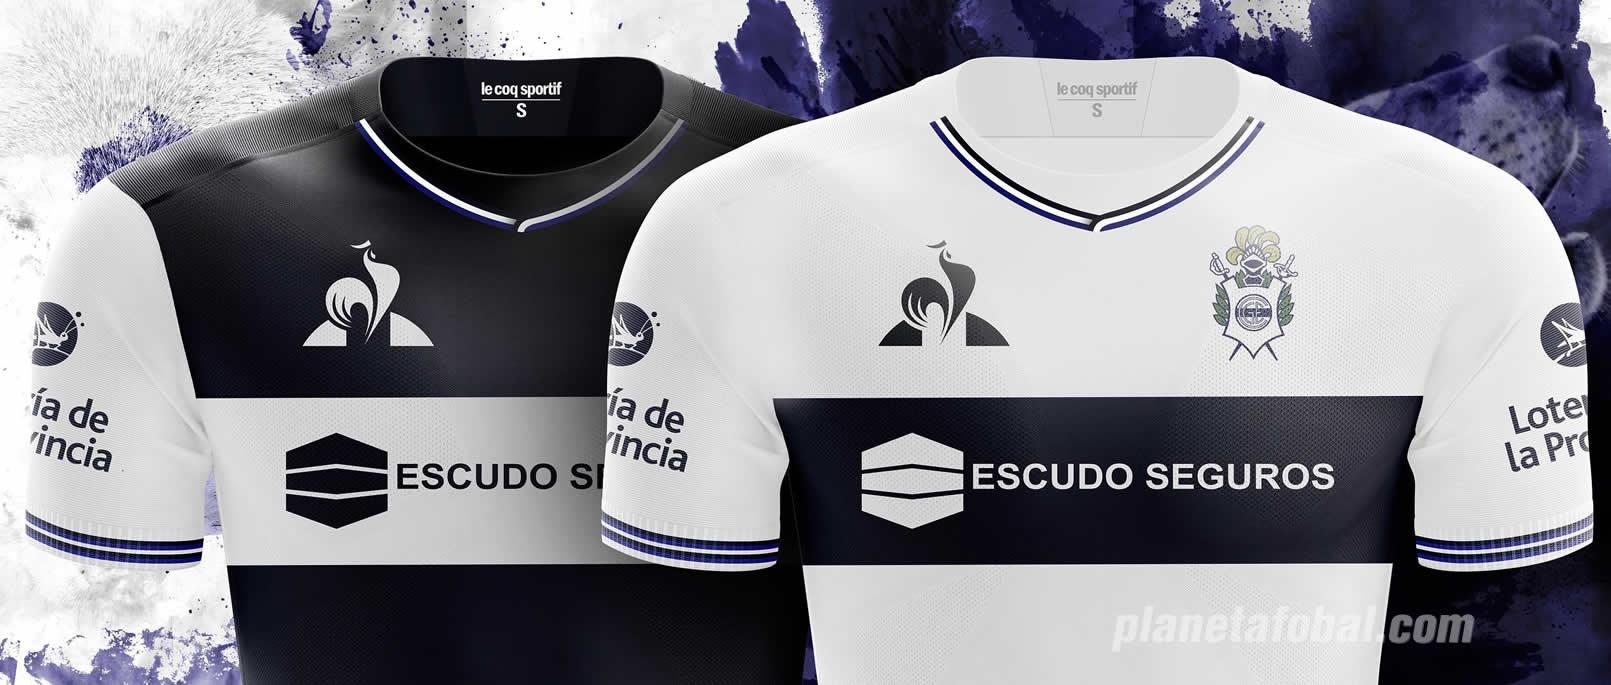 Camisetas 2018/19 de Gimnasia LP | Imagen le coq sportif